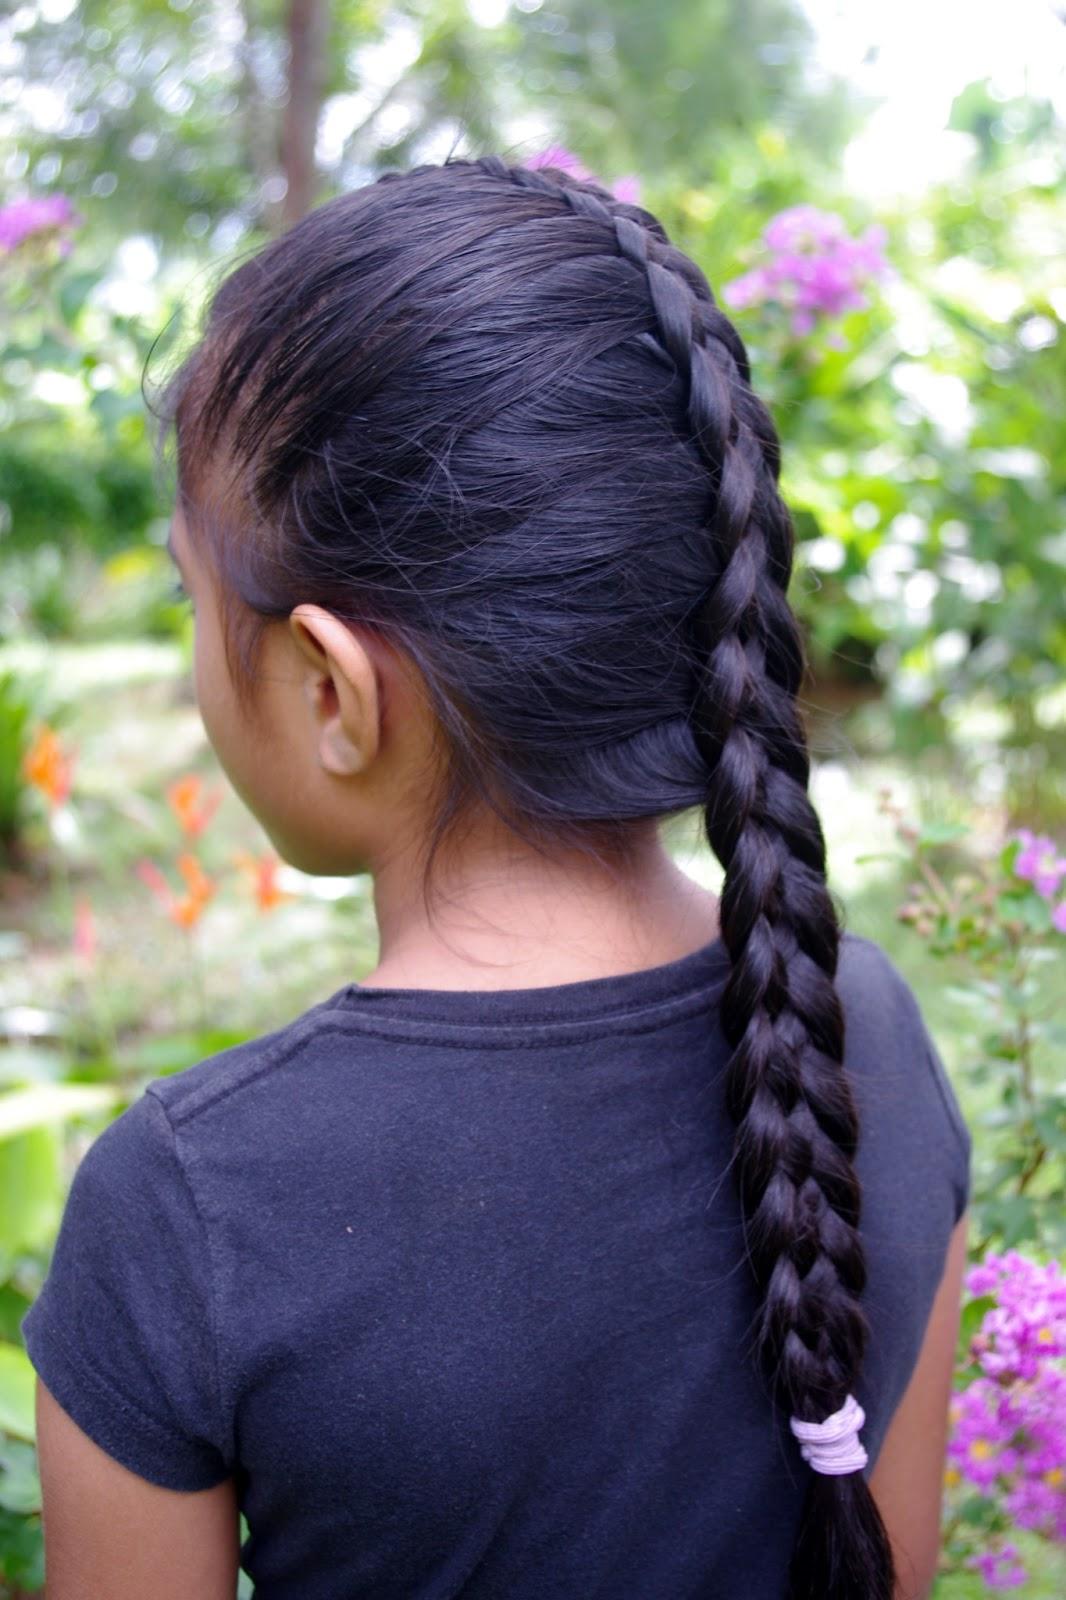 Braids & Hairstyles for Super Long Hair: Micronesian Girl~ 6-Strand French Braid